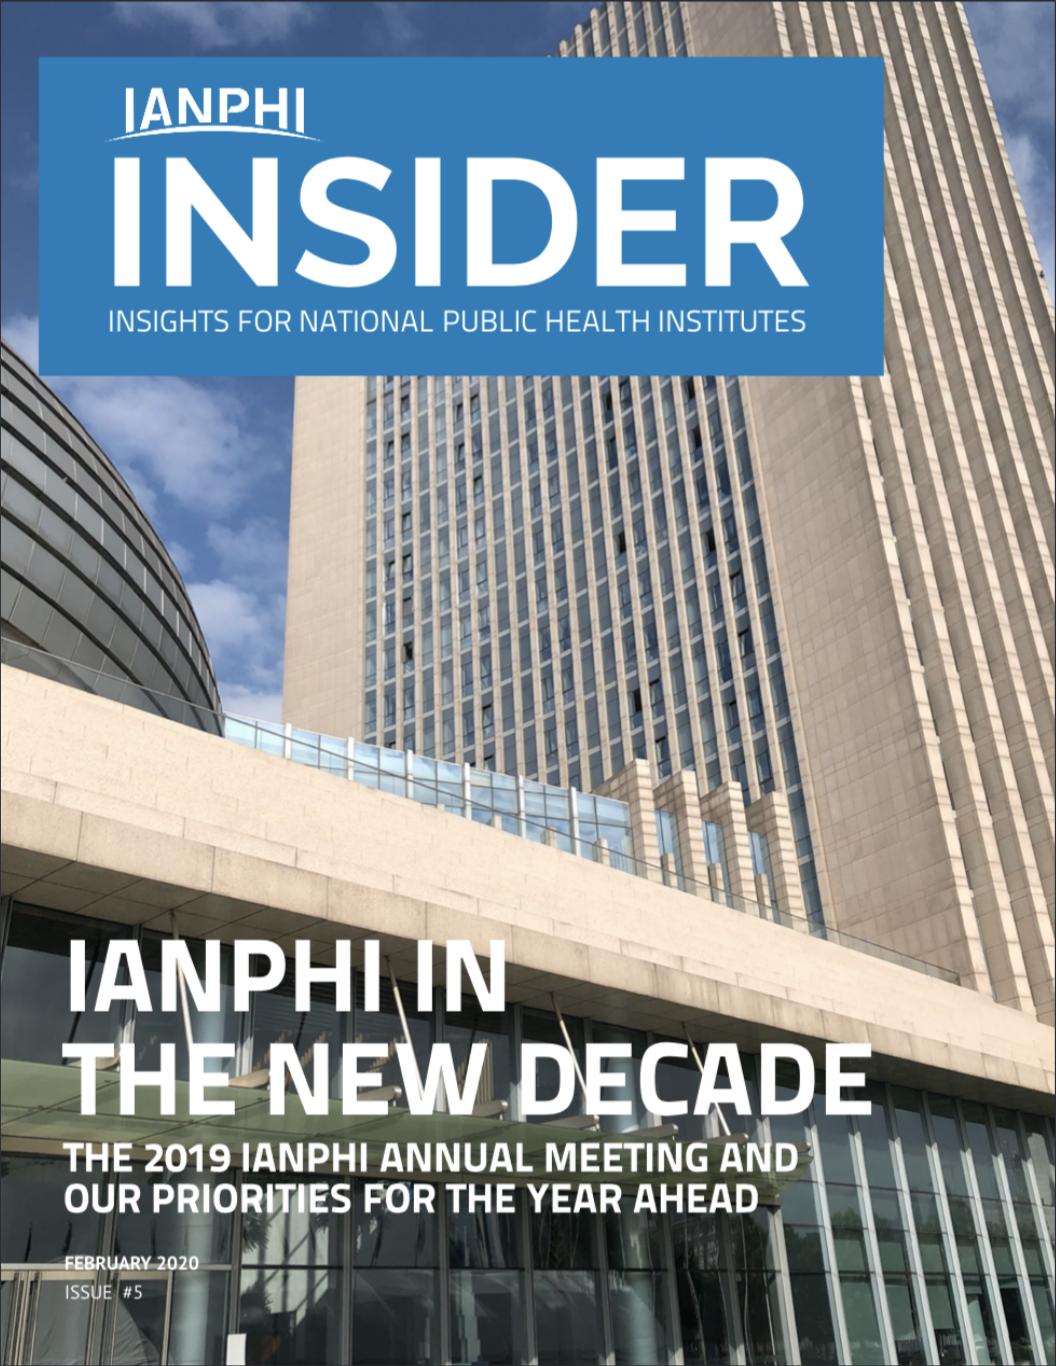 IANPHI-Insider-5-February-2020